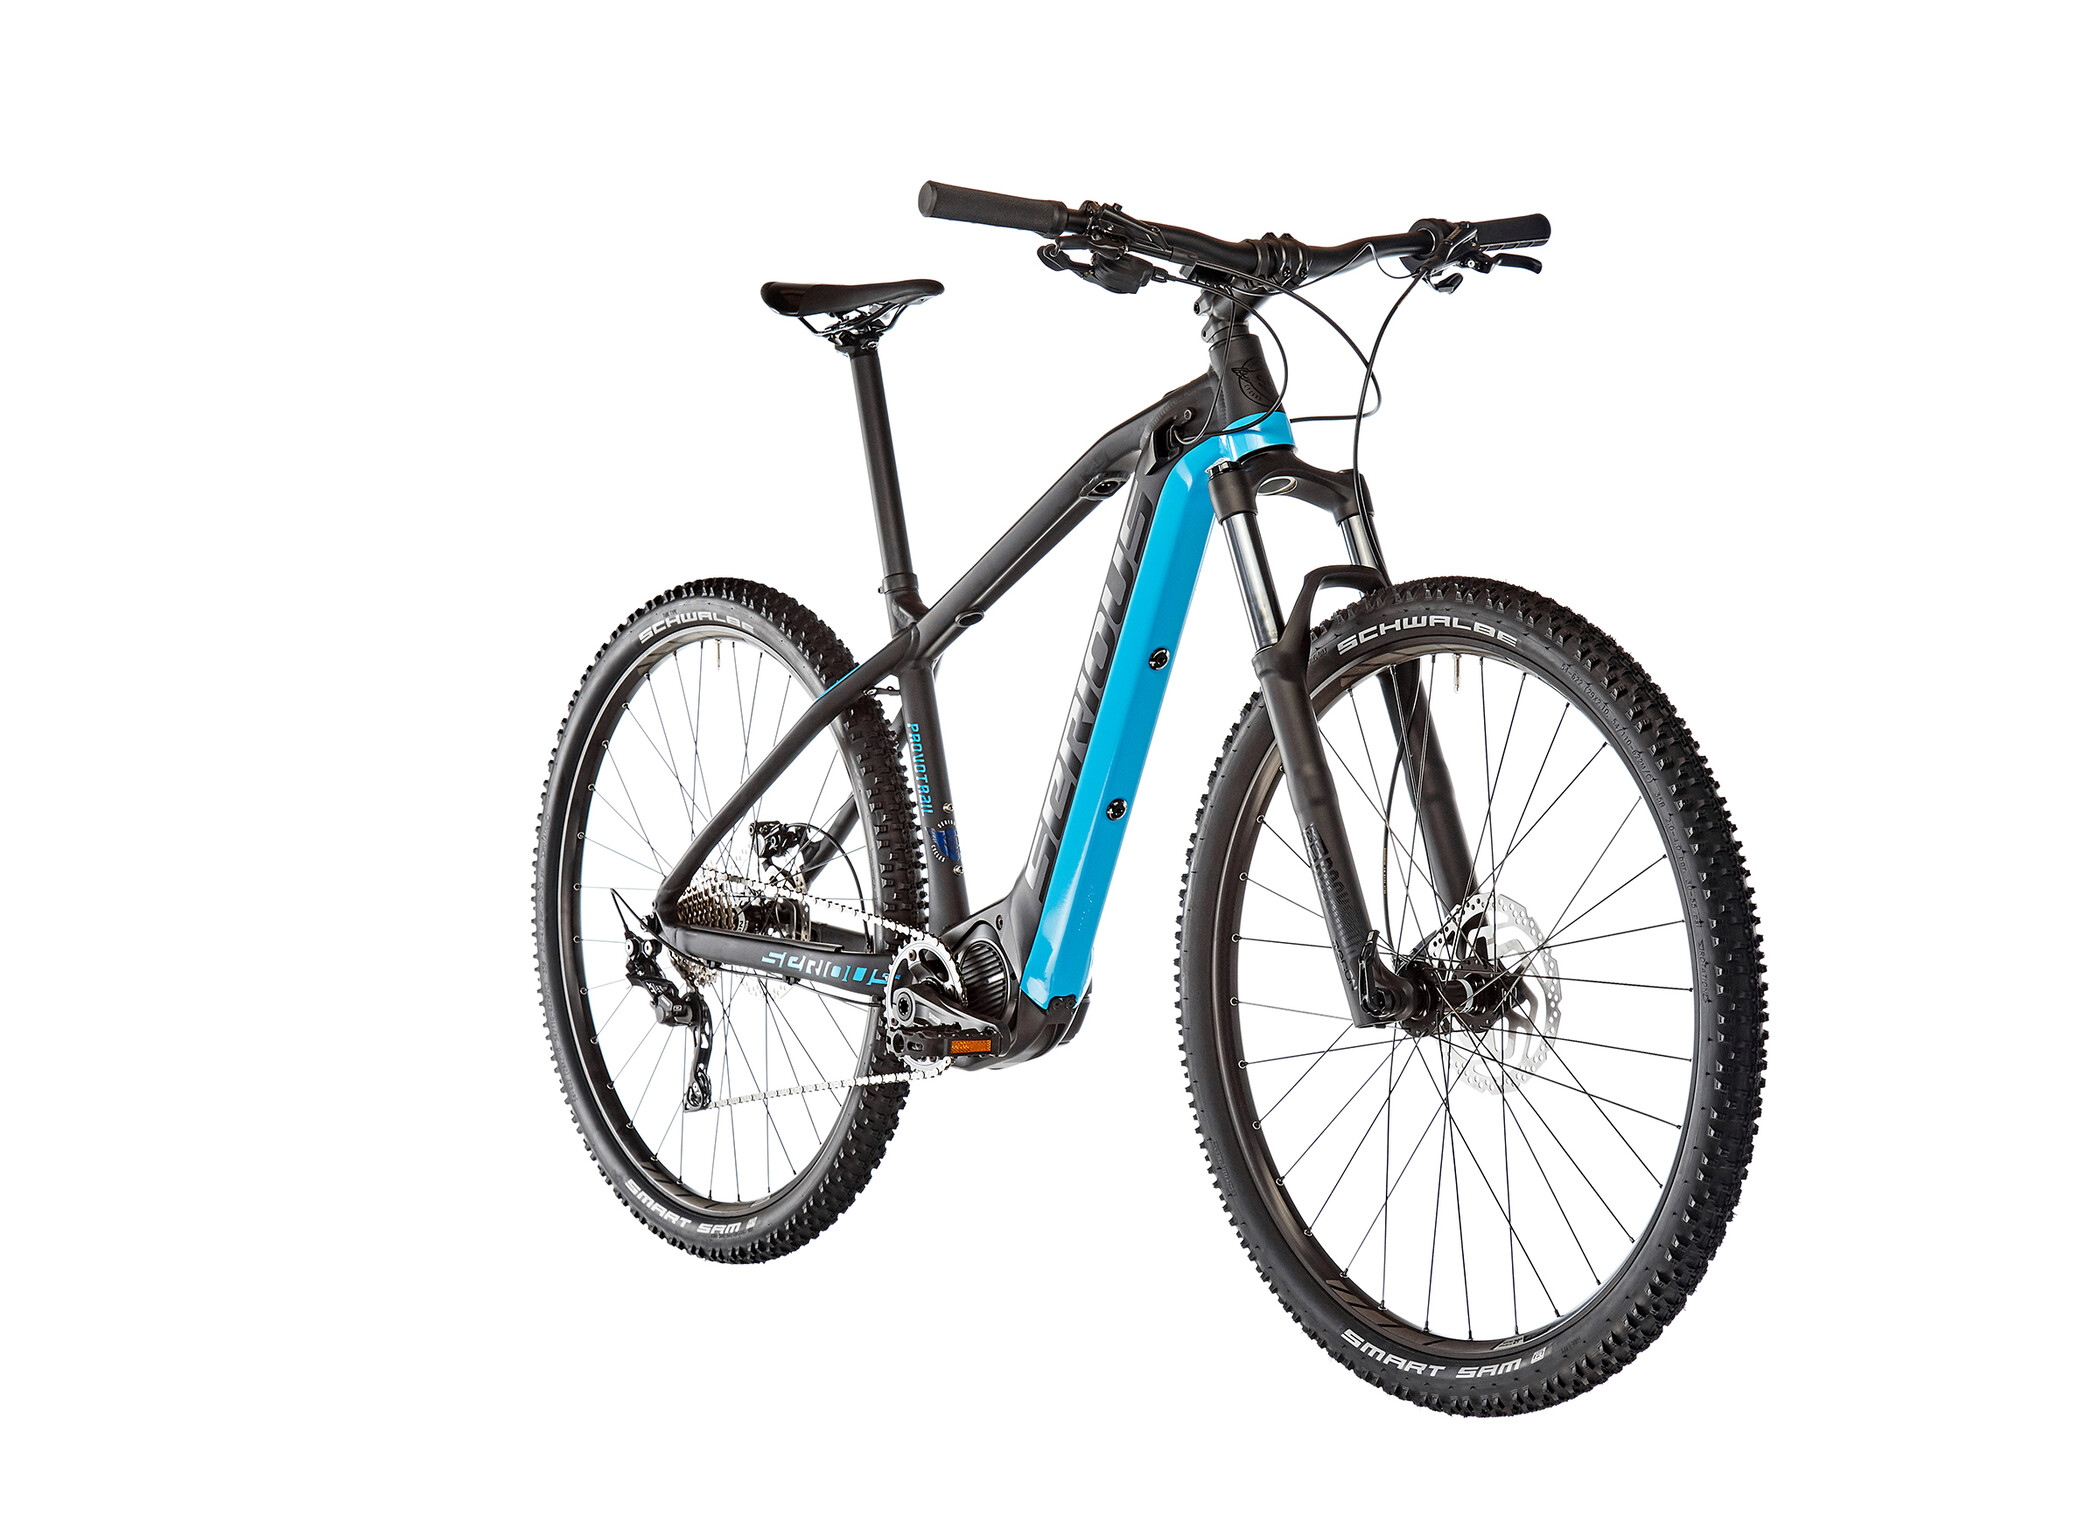 Provo Trail Power 756 Wh, sort | e-bike battery